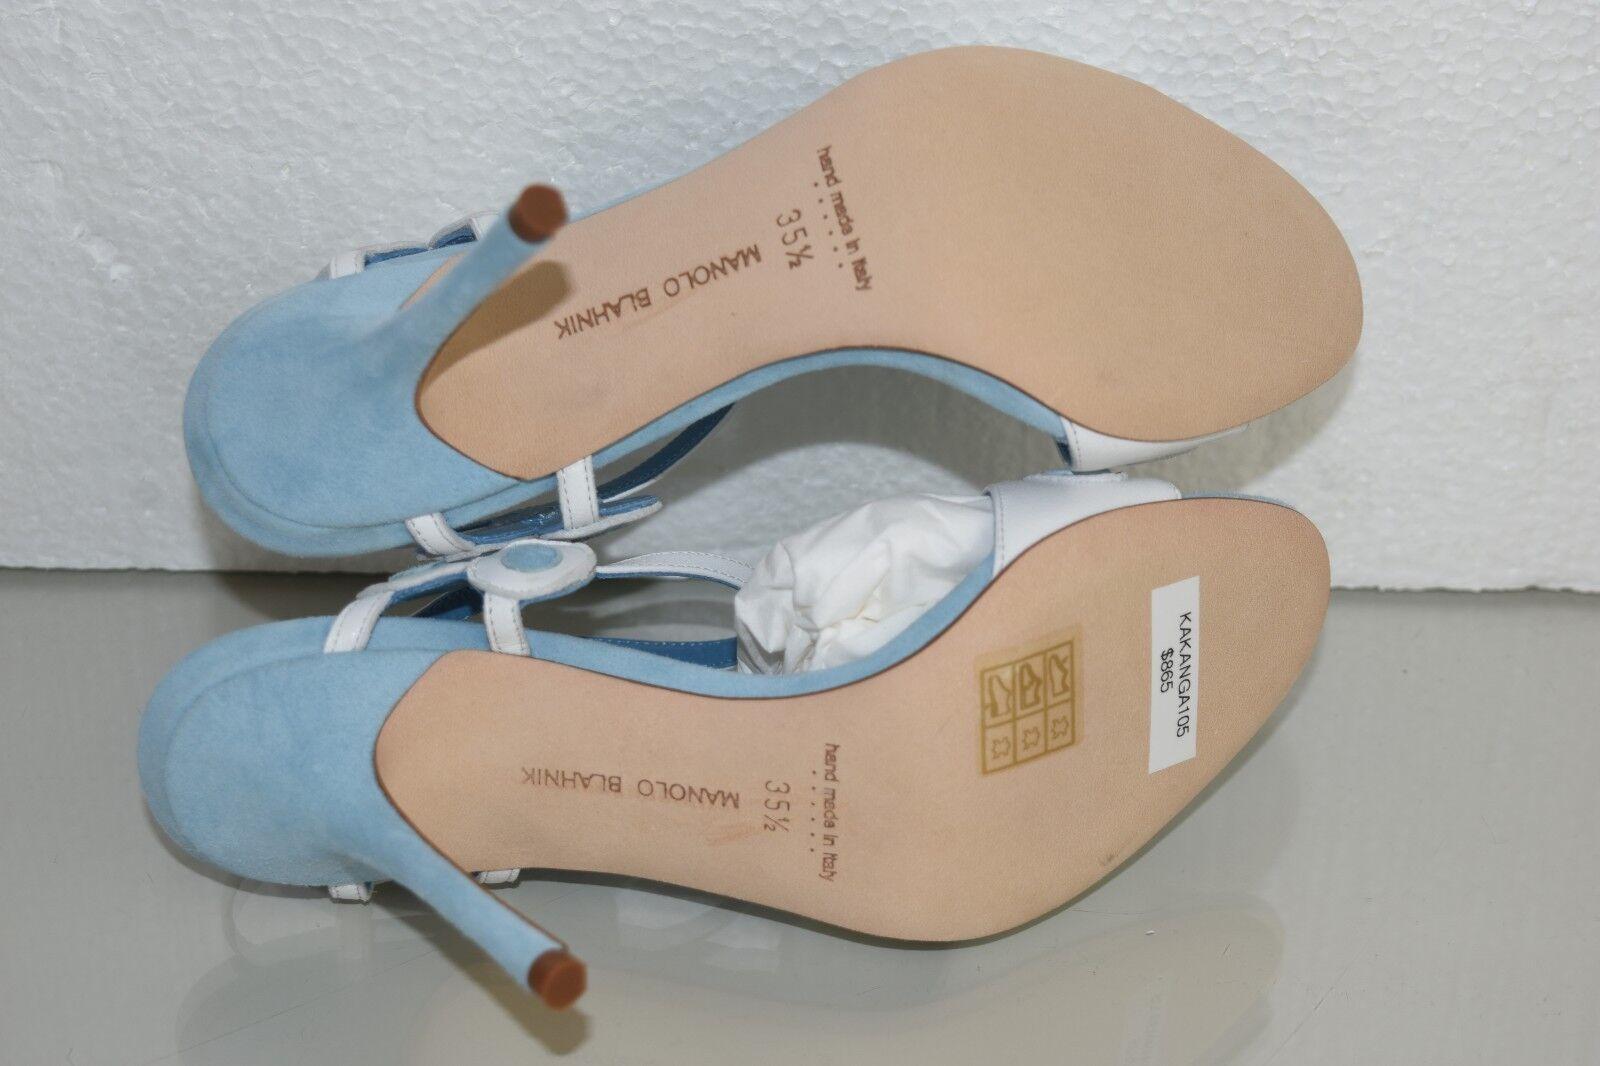 845 New Manolo Blahnik KAKANGA Blau Leather Sandals Blau KAKANGA Weiß schuhe 36 37 38.5 41 8abe48